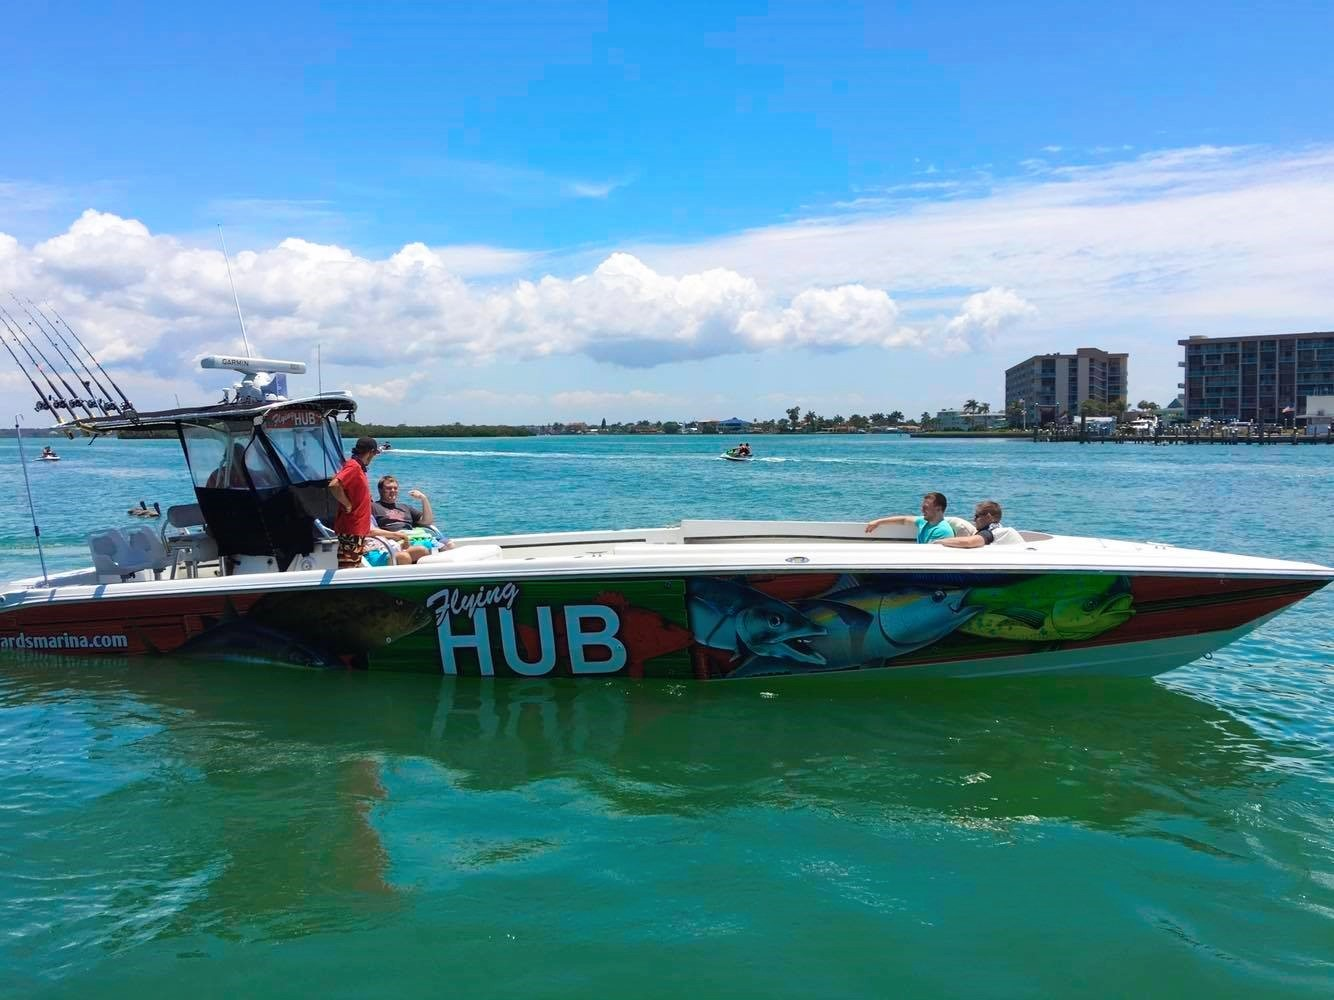 Private fishing charters hubbard 39 s marina john 39 s pass fl for Johns pass fishing